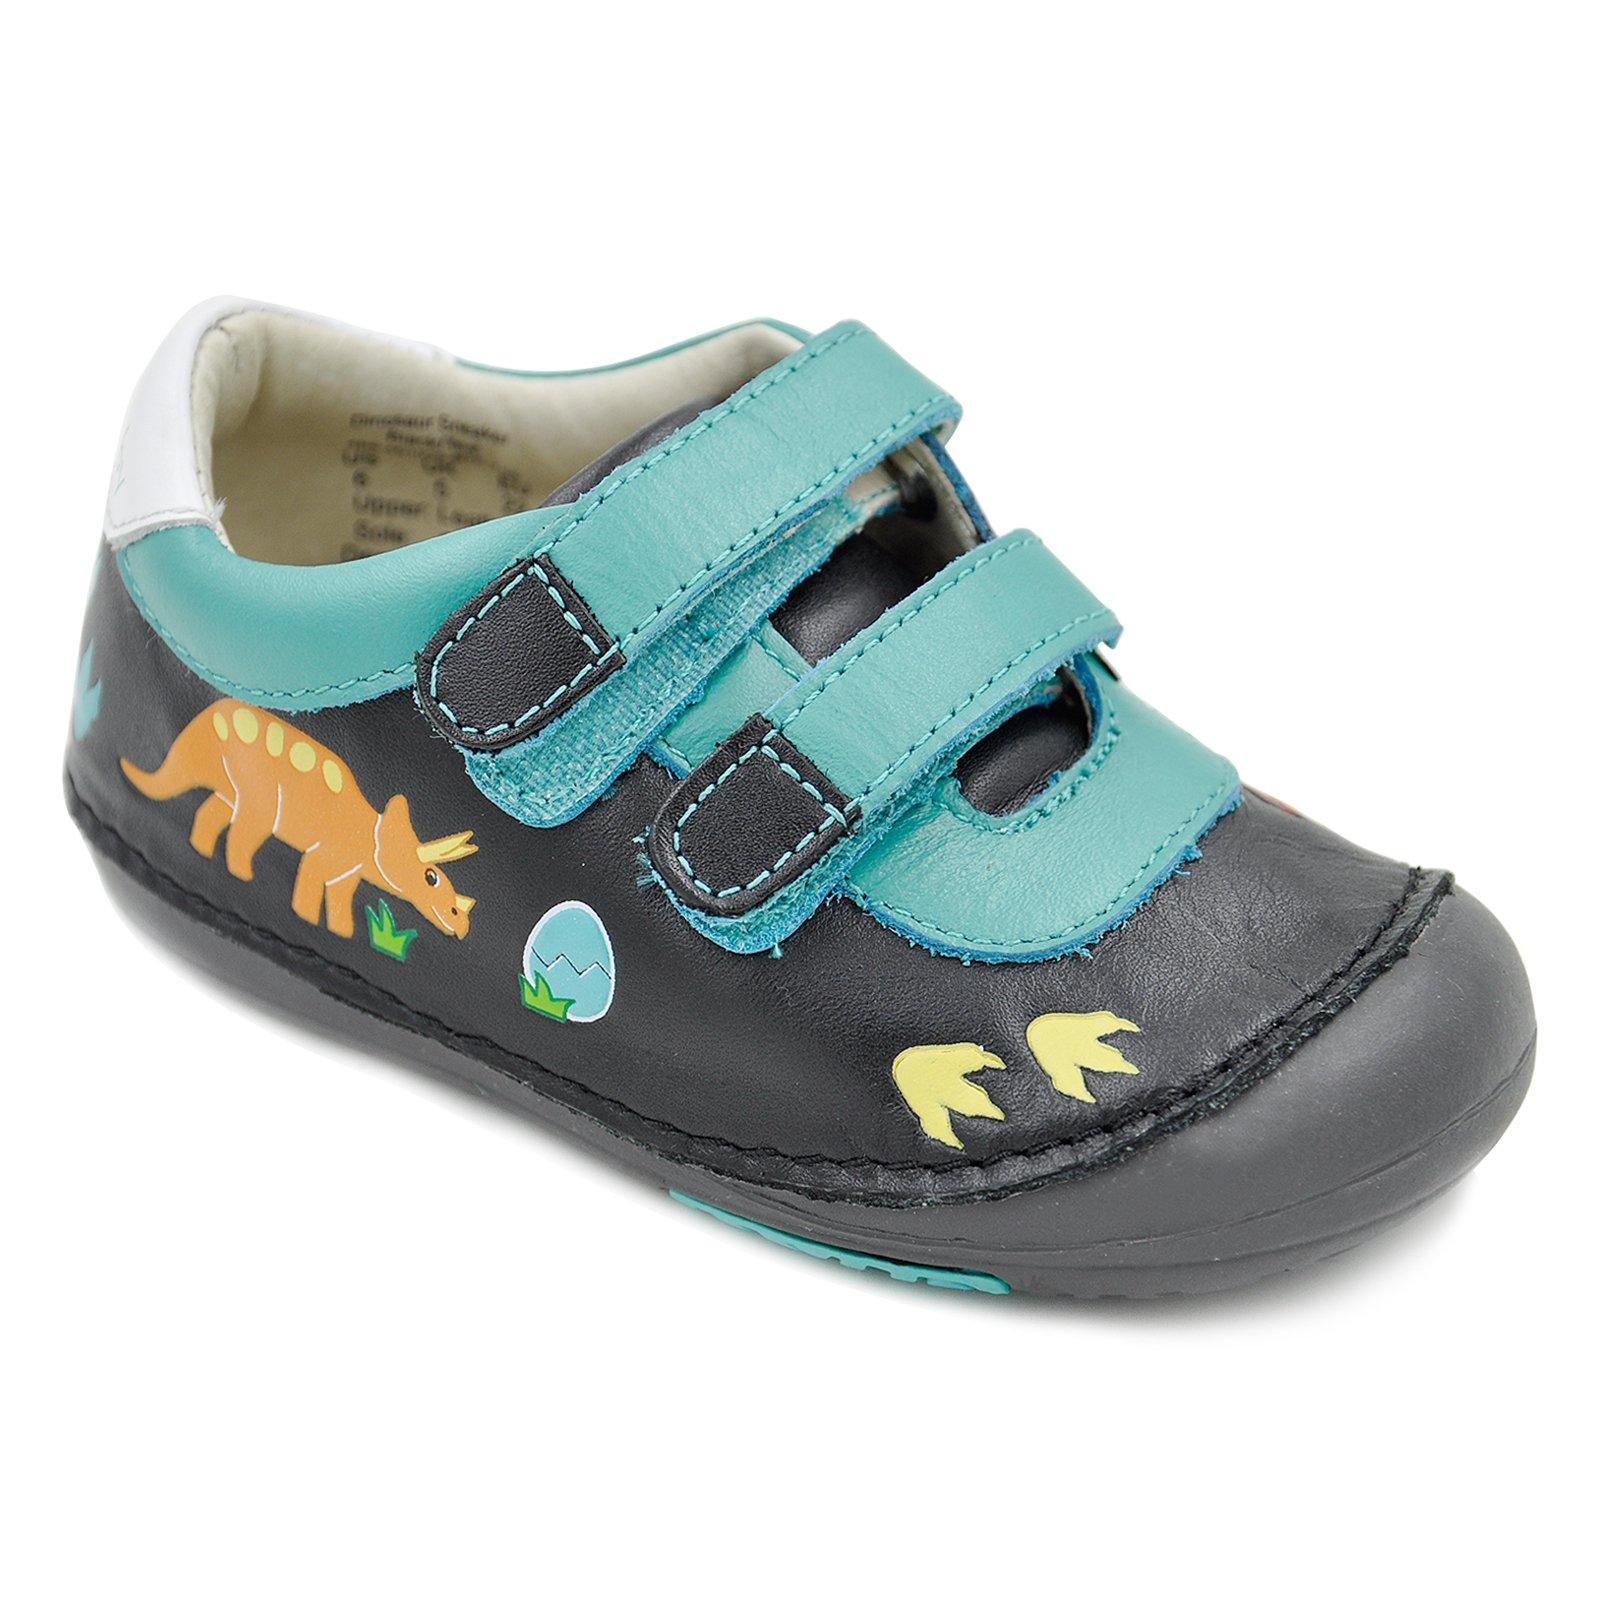 Momo Baby Boys First Walker/Toddler Dinosaur Sneaker Black/Teal Leather Shoes - 5 M US Toddler